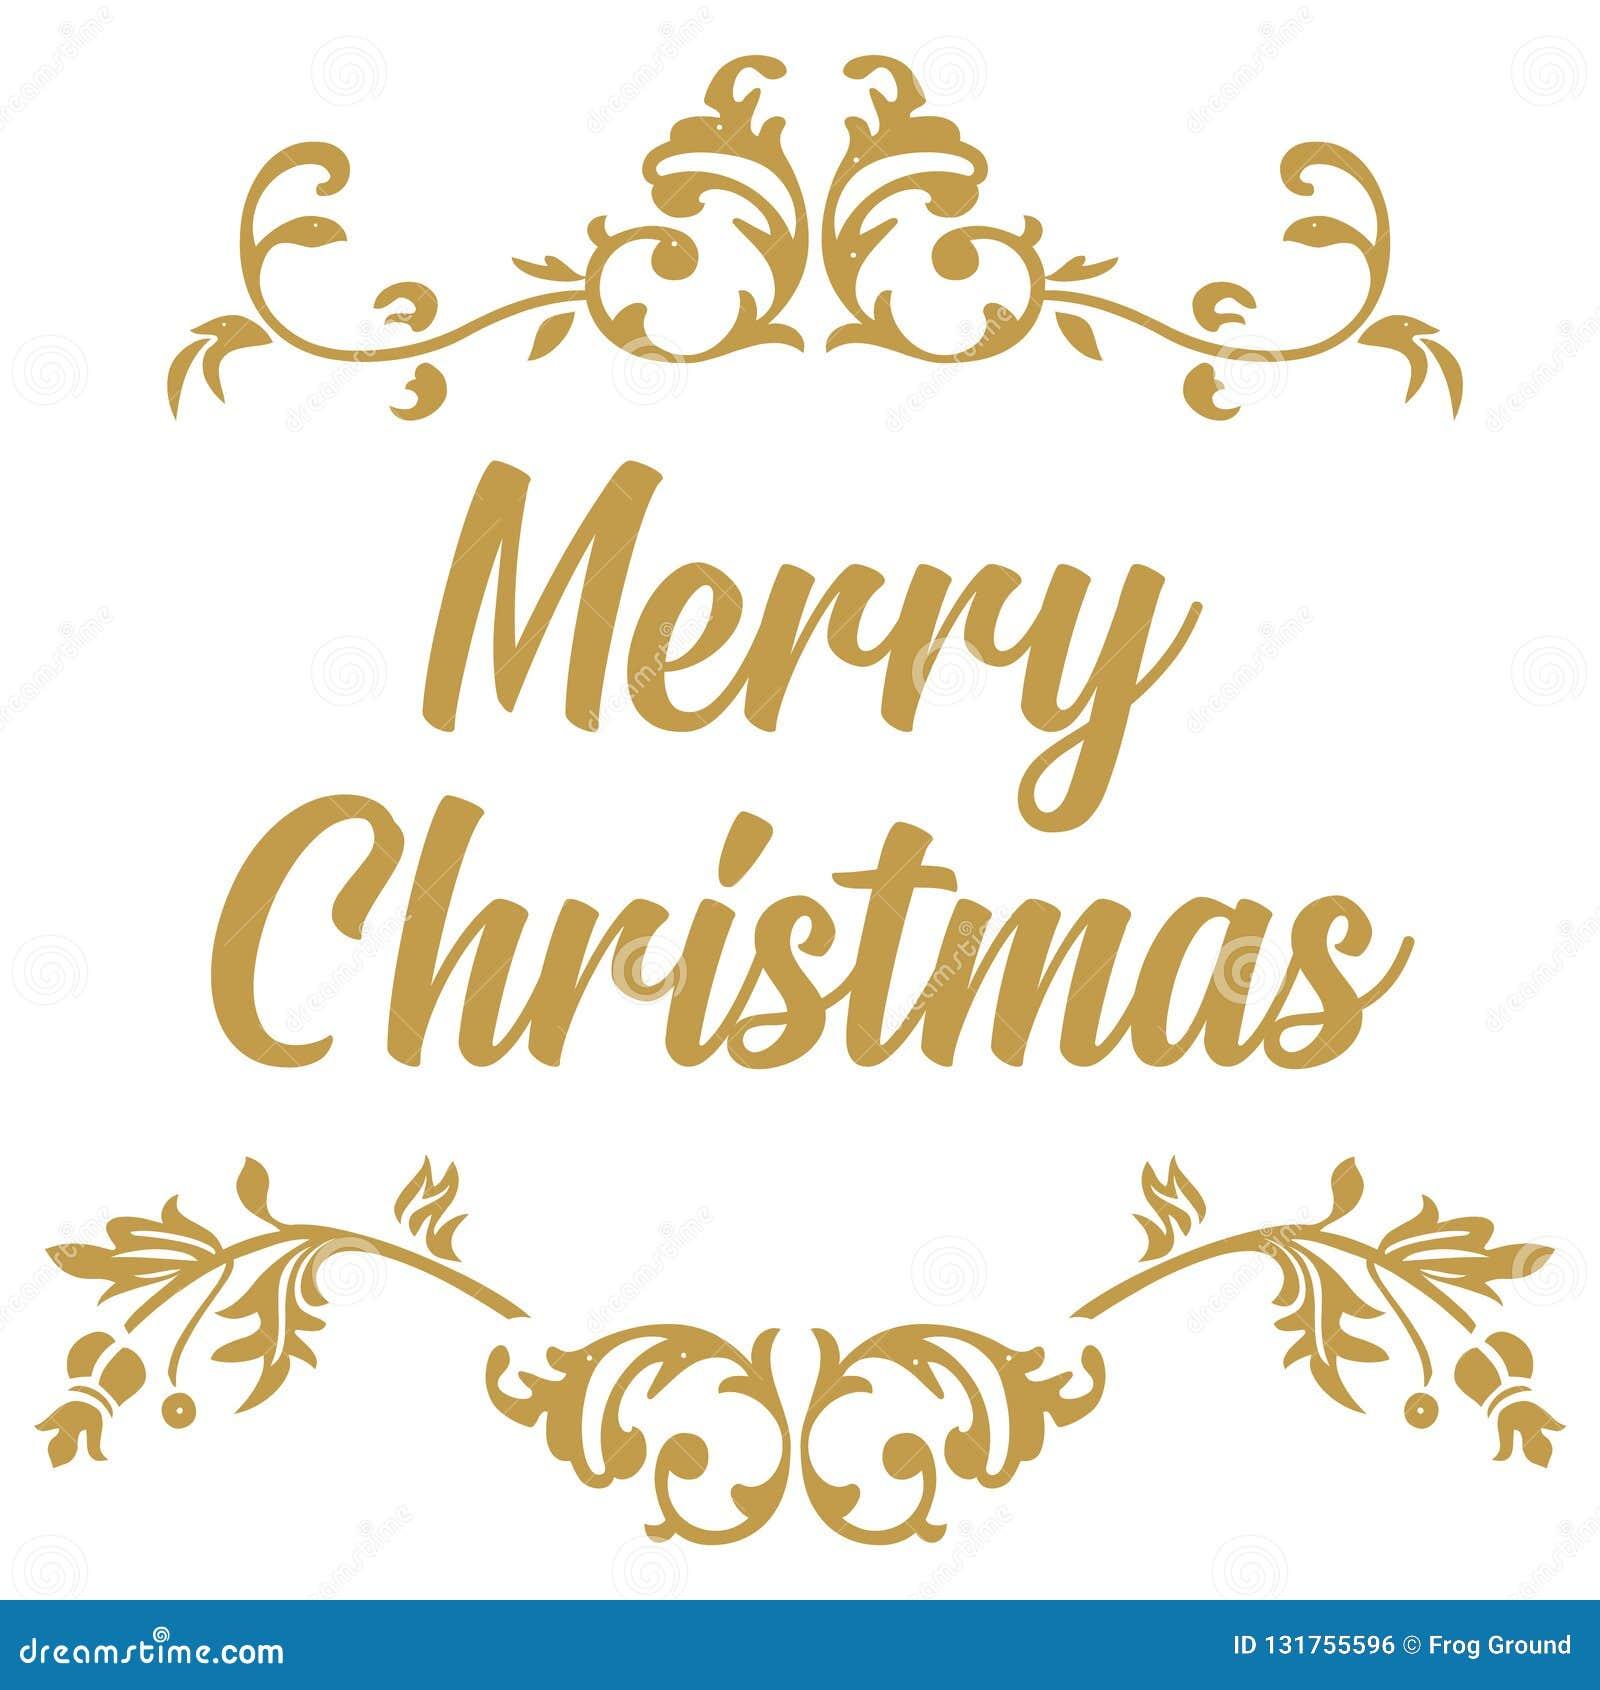 Merry Christmas. Christmas Calligraphy. Handwritten Modern ...